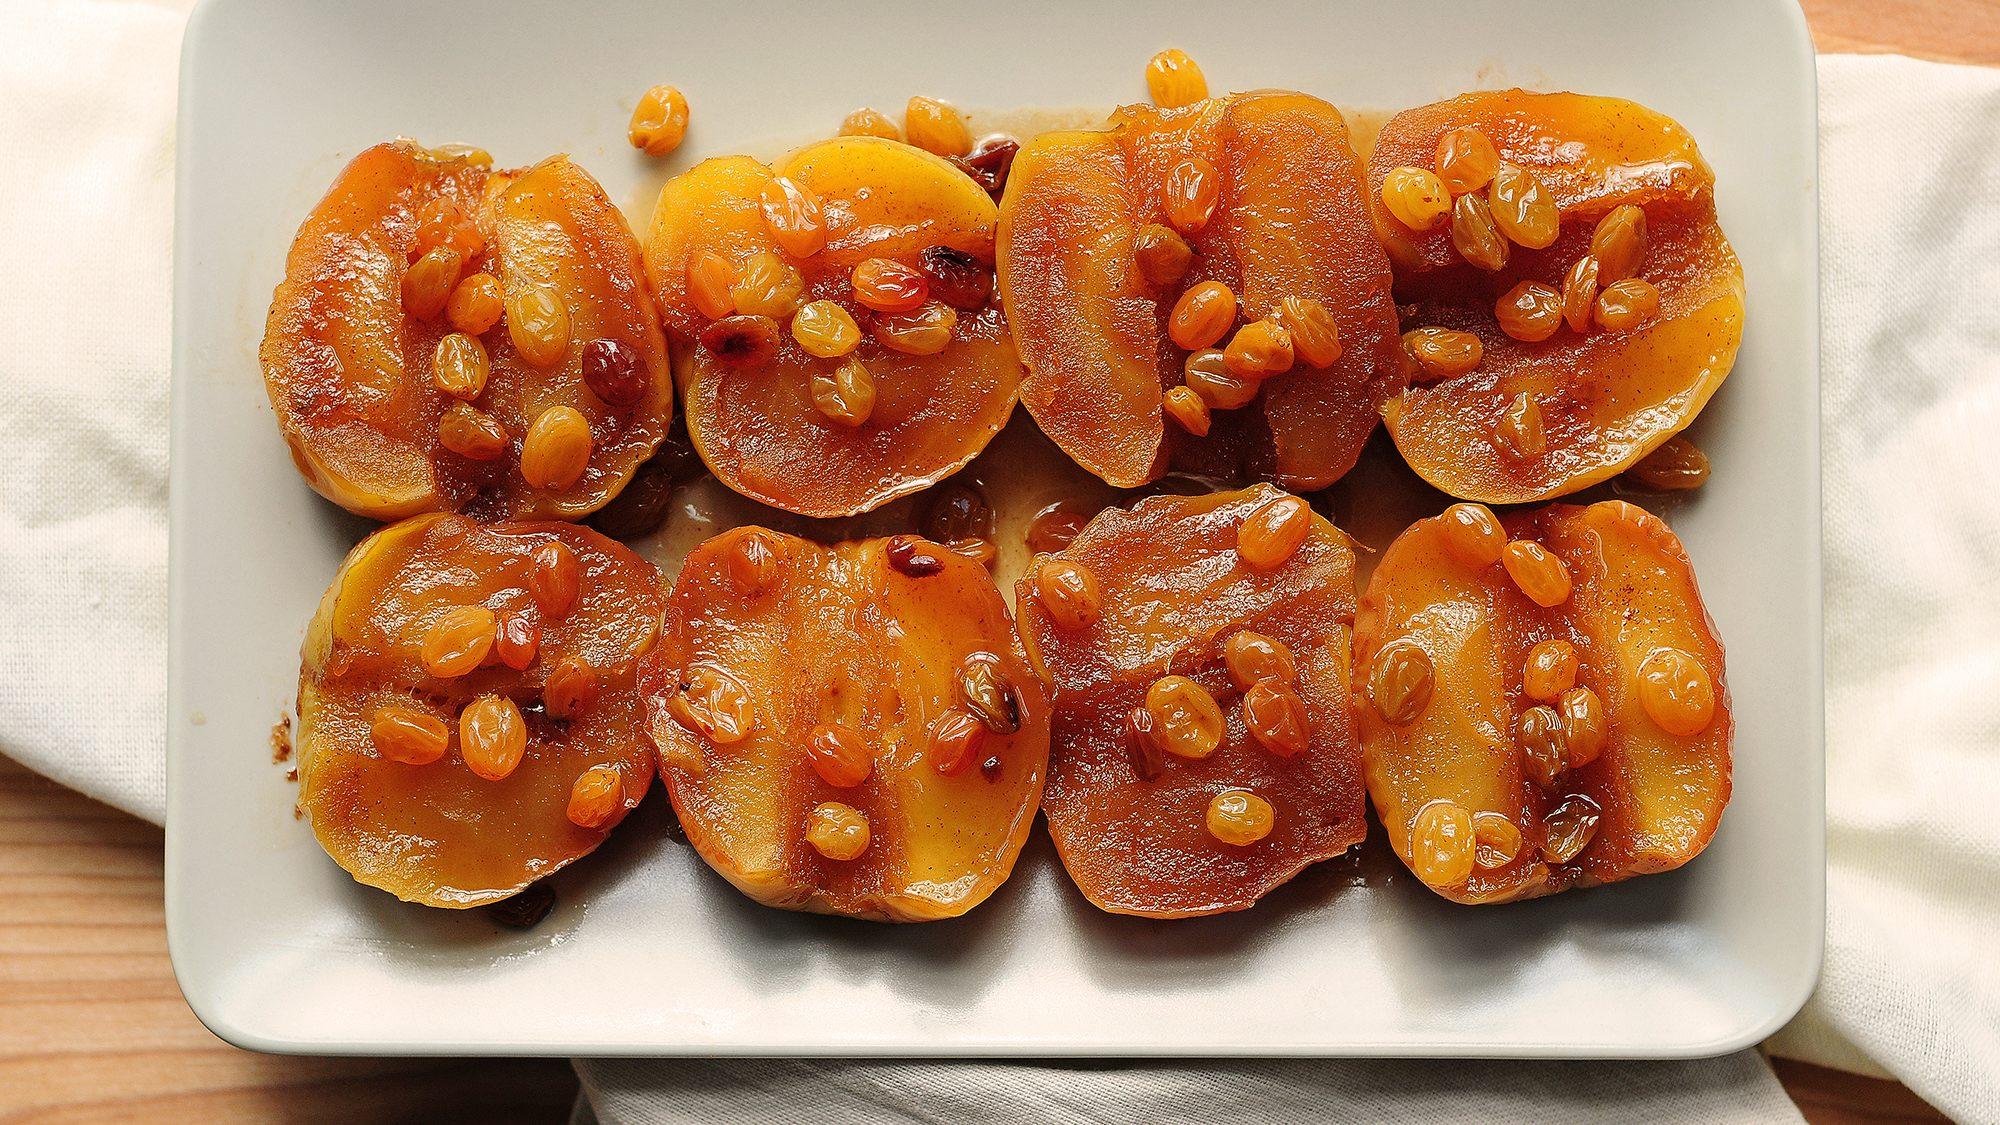 McCormick Gourmet Ale Almond Roasted Apples